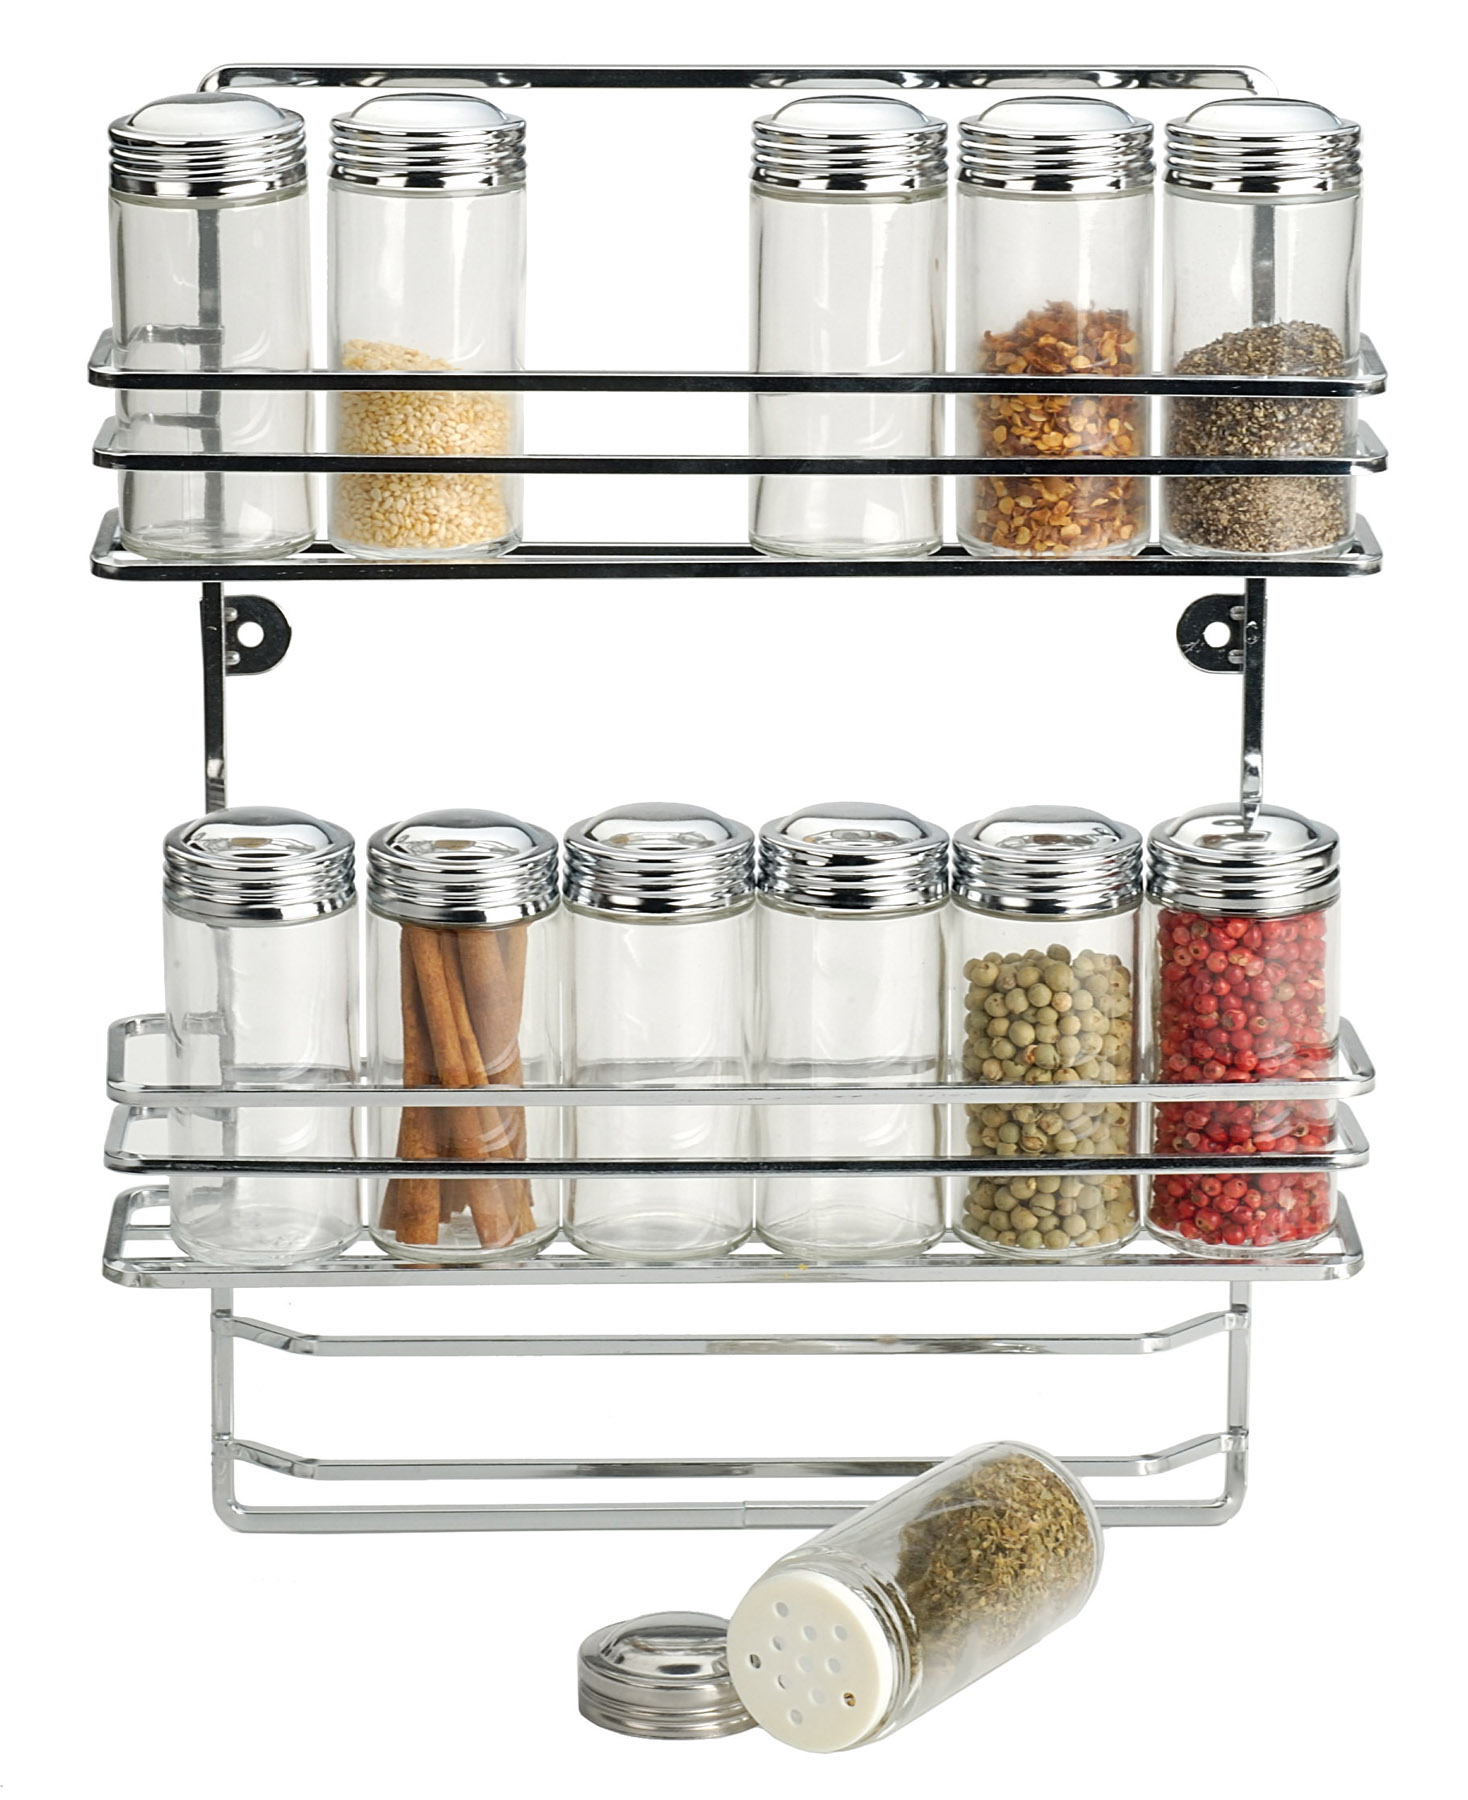 Rsvp wall cabinet mount herb spice rack 12 bottle jar kitchen organization new ebay - Wall mounted spice racks for kitchen ...